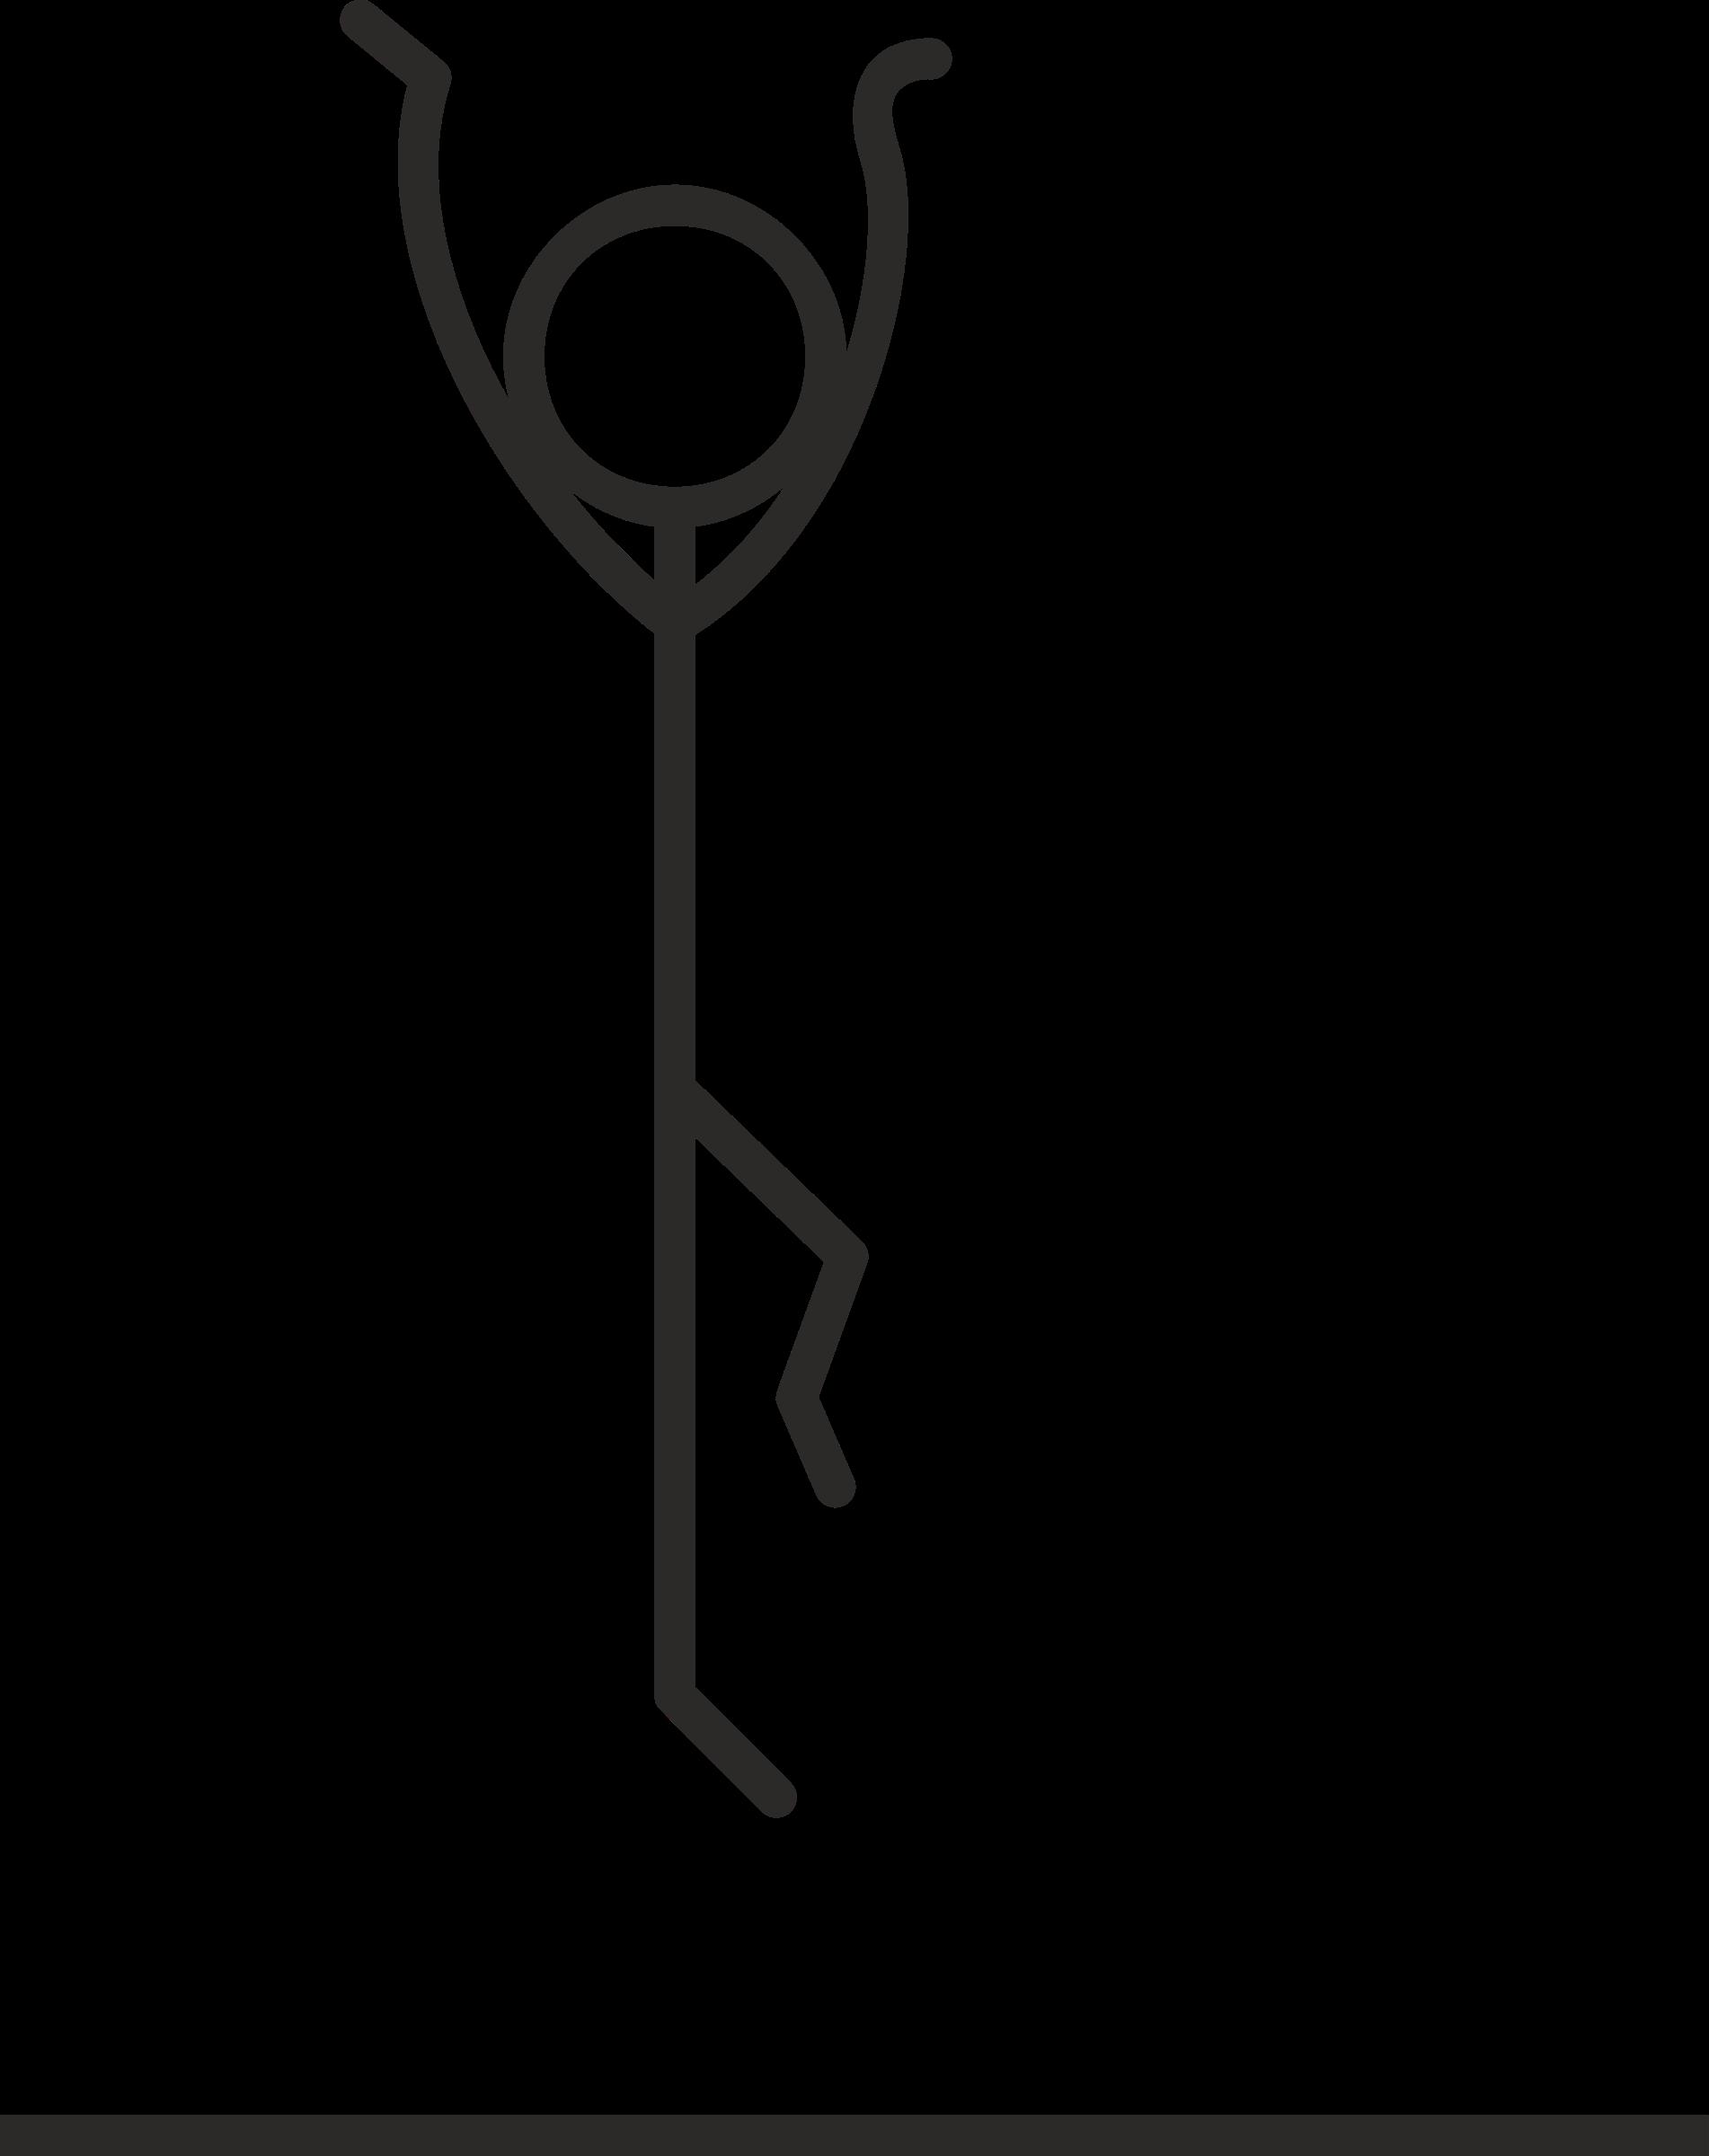 1902x2400 Jump Clipart Stick Figure